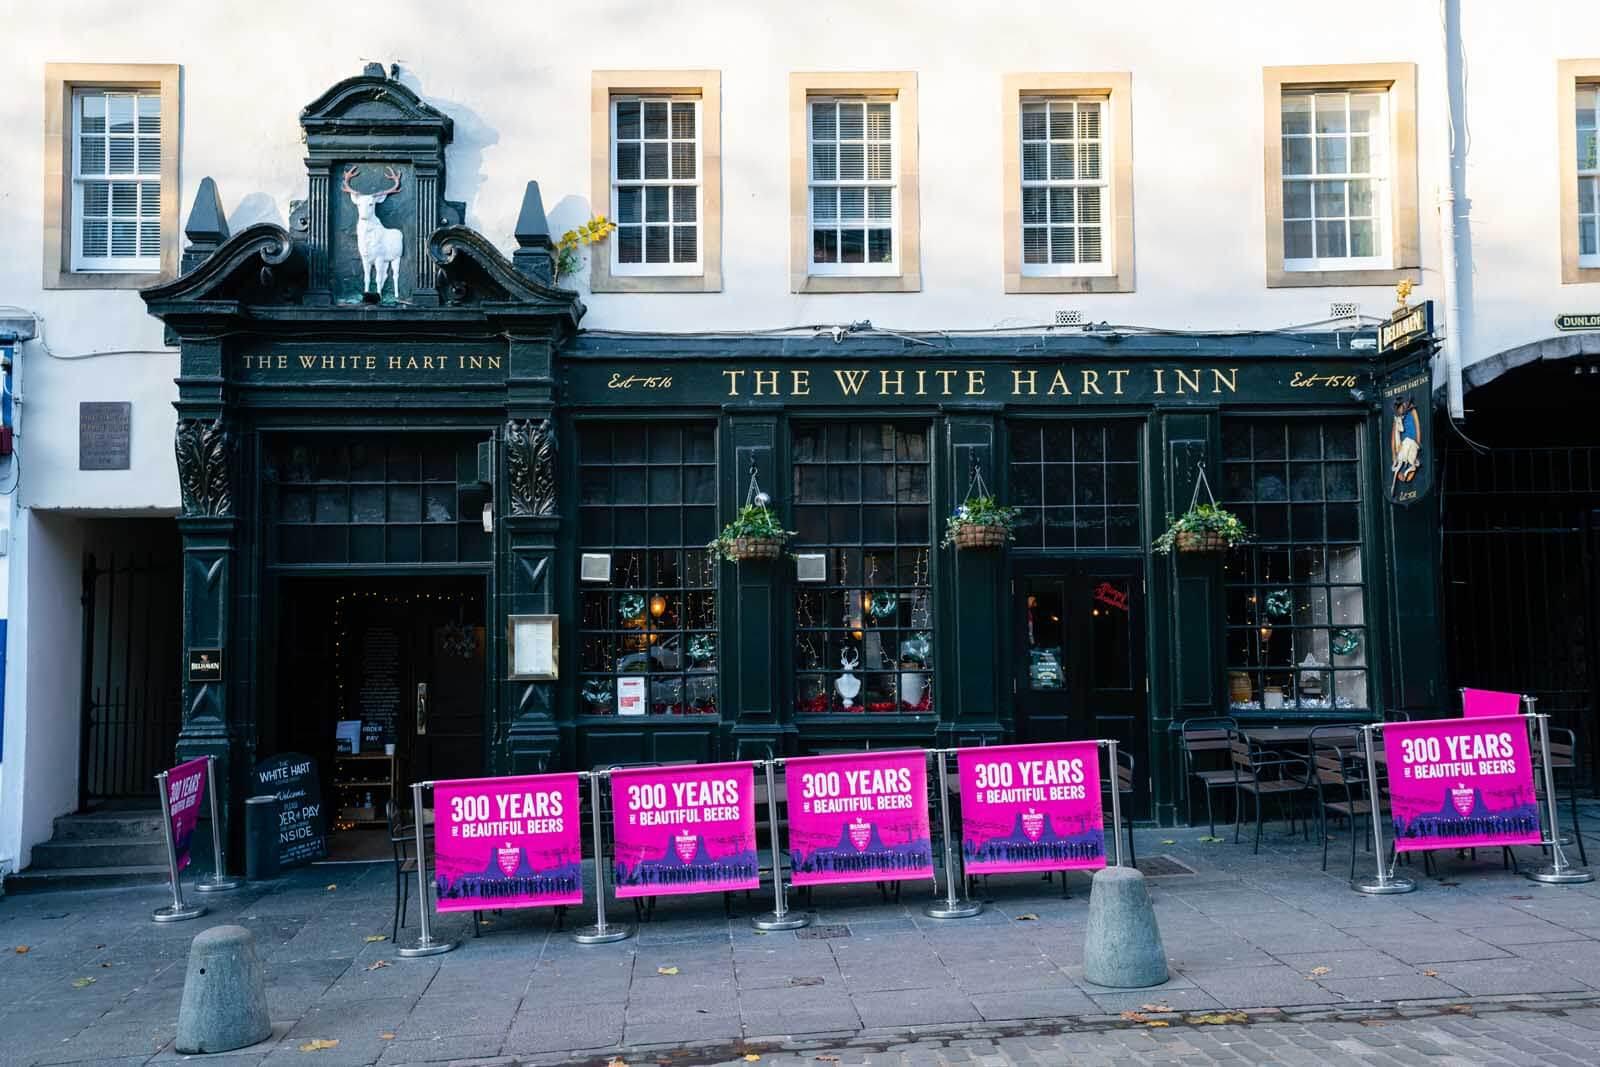 The White Hart Inn Edinburgh pub crawl